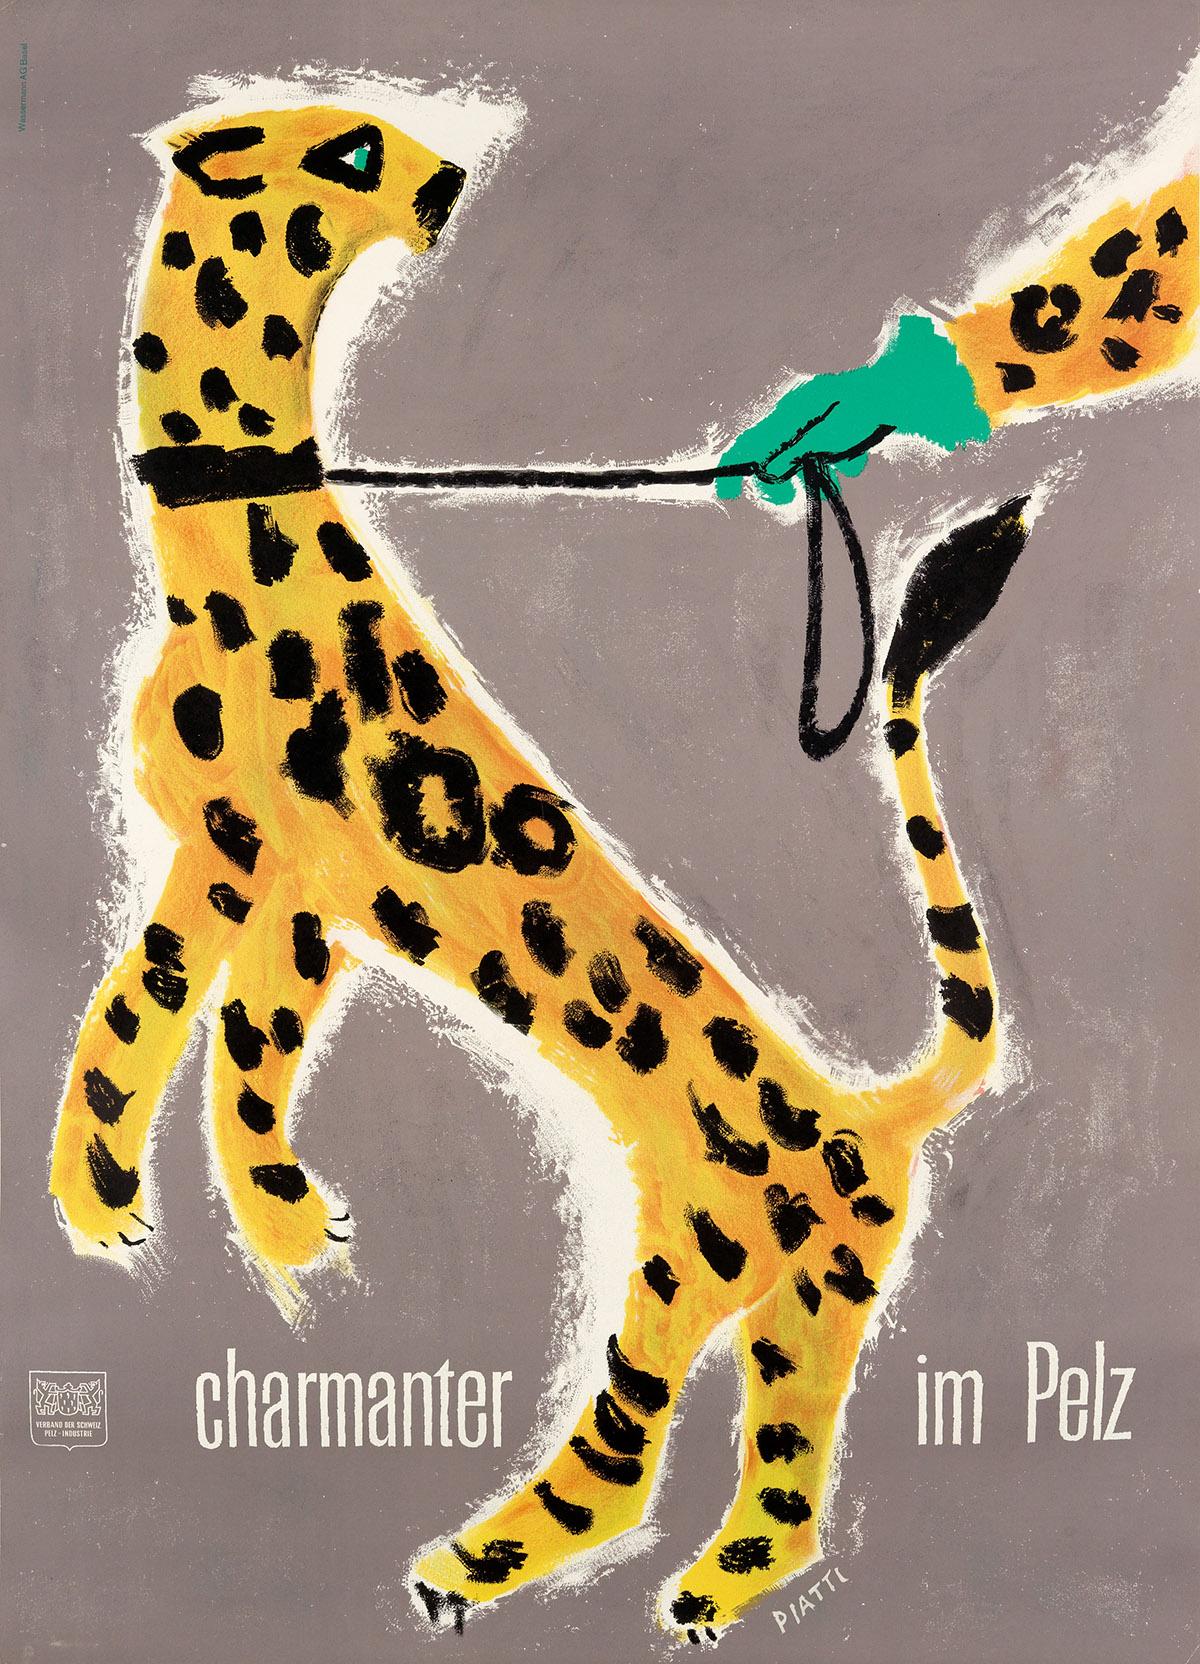 CELESTINO PIATTI (1922-2007). CHARMANTER IM PELZ. 1952. 49x35 inches, 126x90 cm.